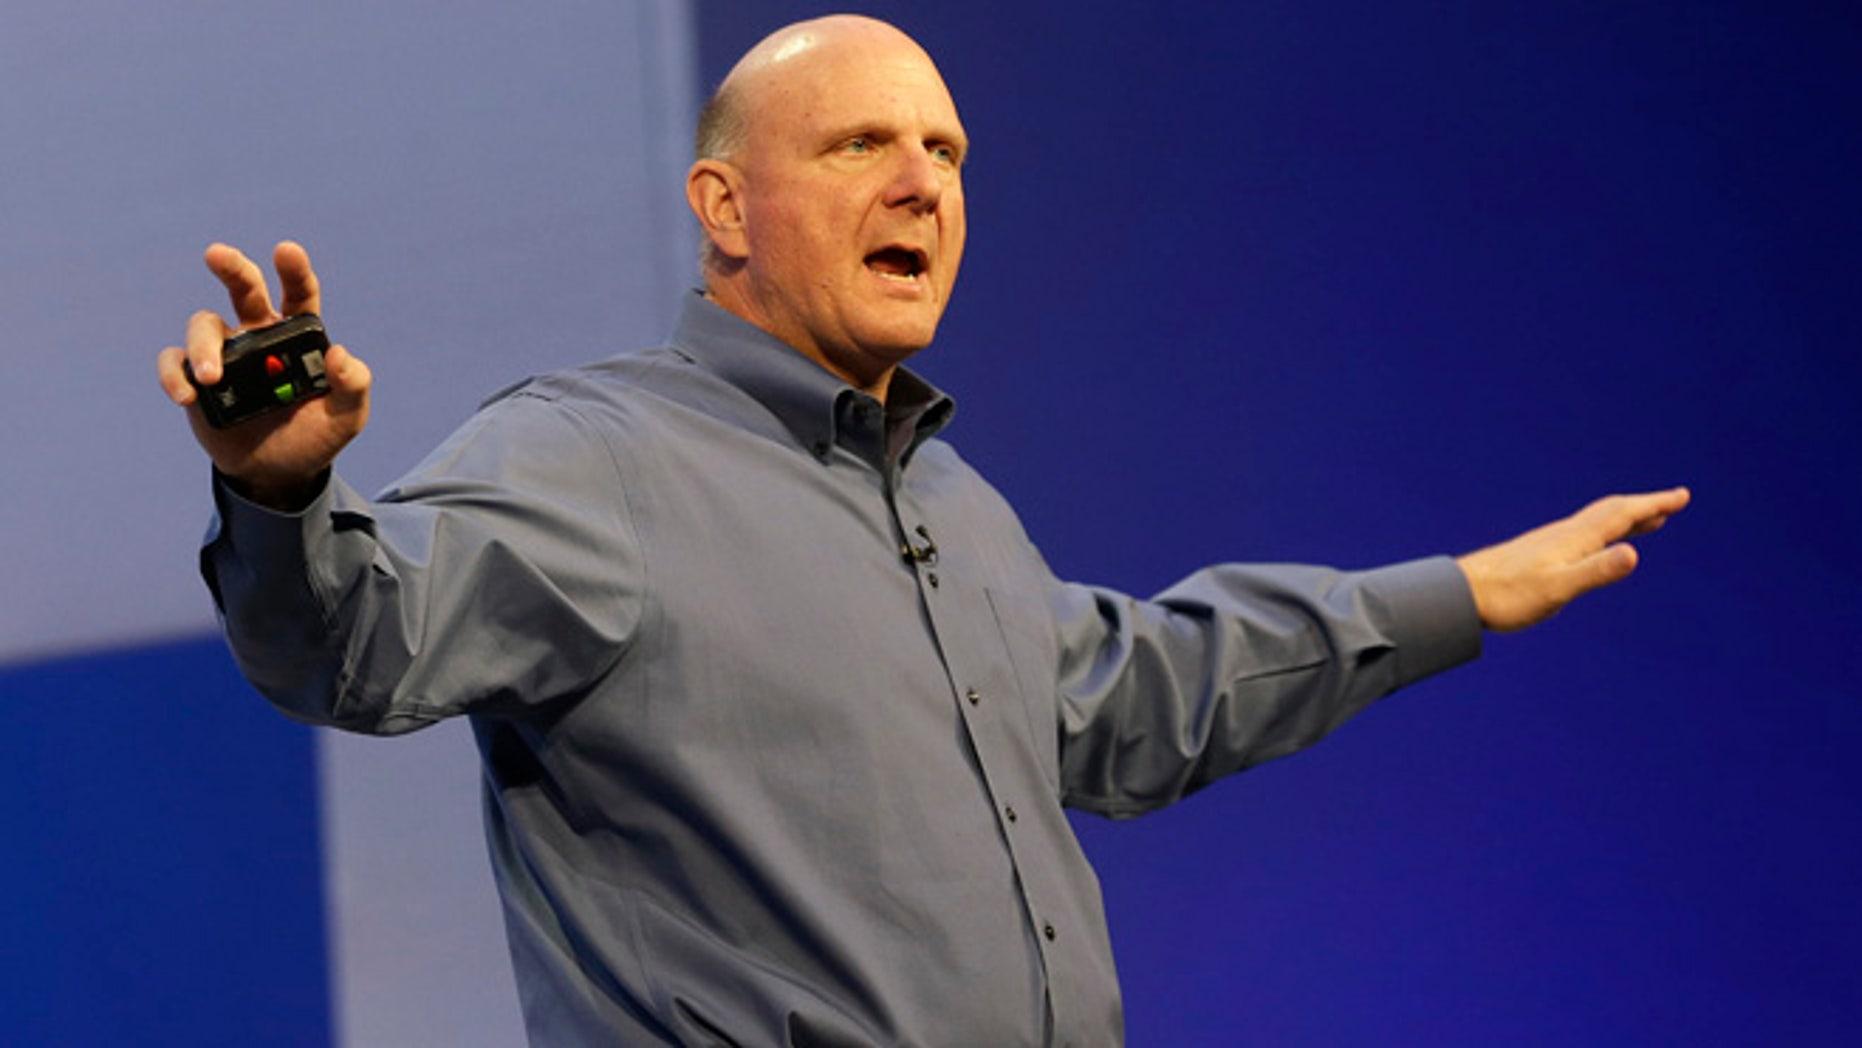 Microsoft CEO Steve Ballmer speaks at an event in San Francisco.